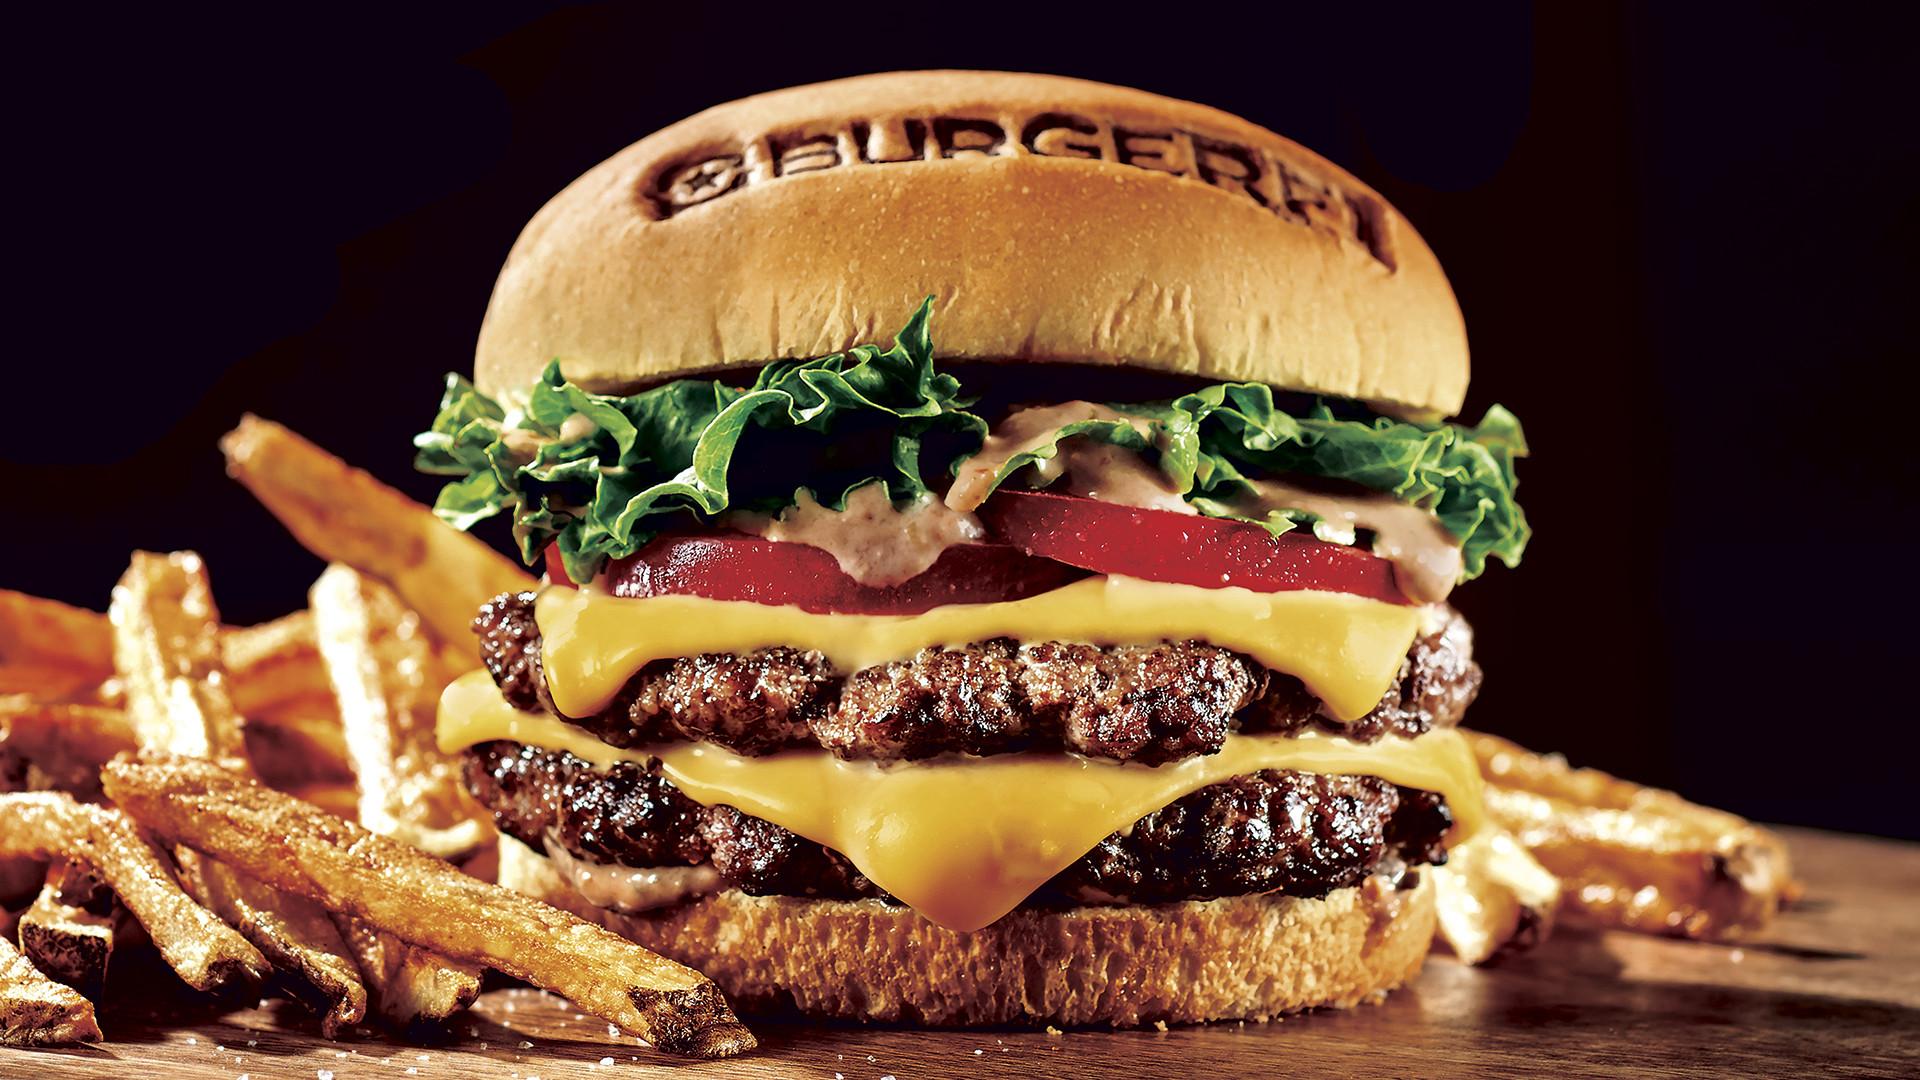 BurgerFi's impressive American-style burgers